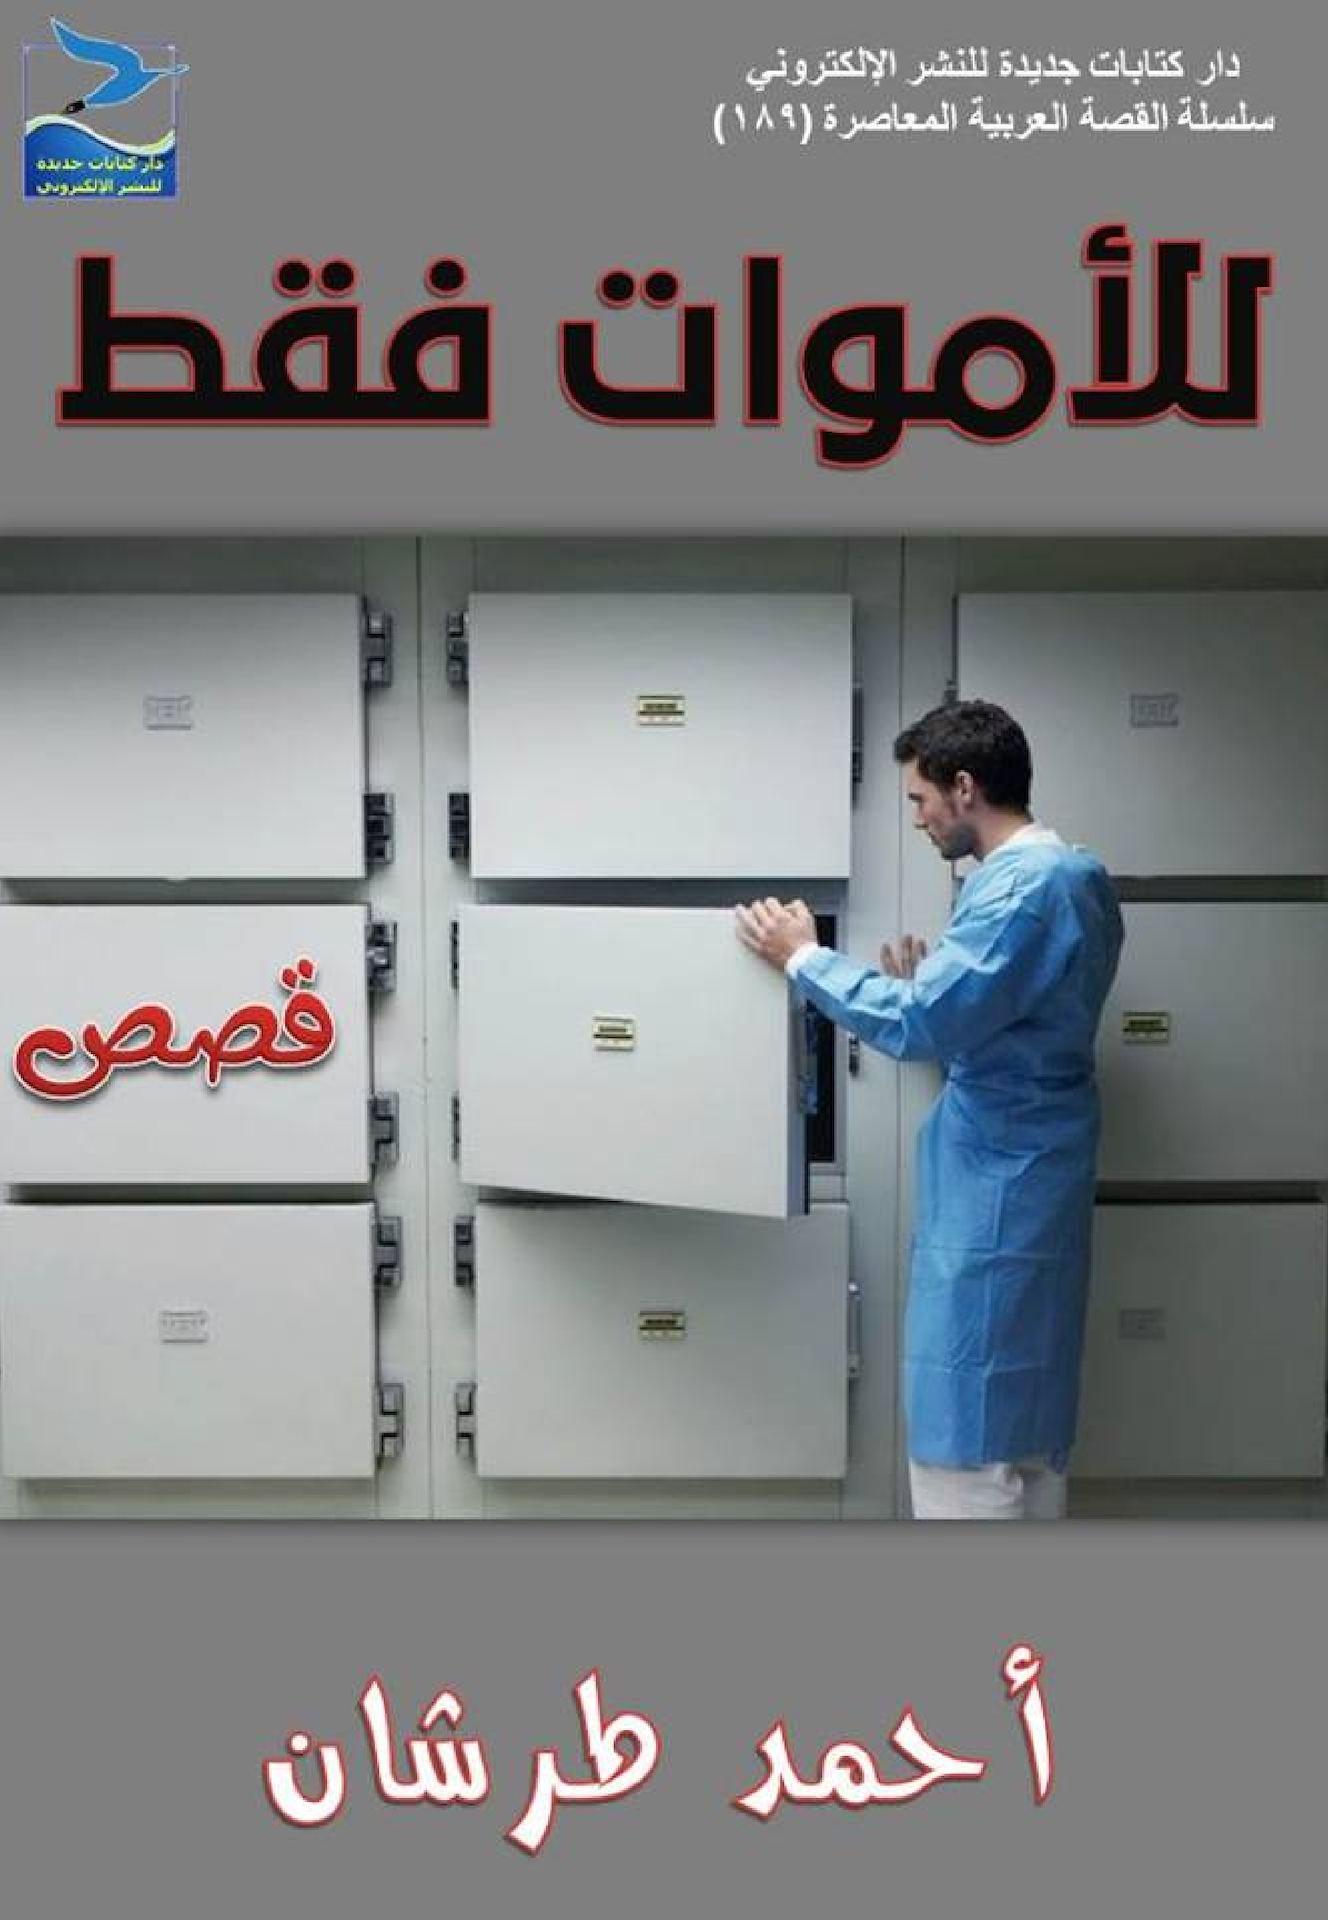 cc72c0727 Calaméo - أحمد طرشان، للأموات فقط، قصص، ط1، أكتوبر 2016